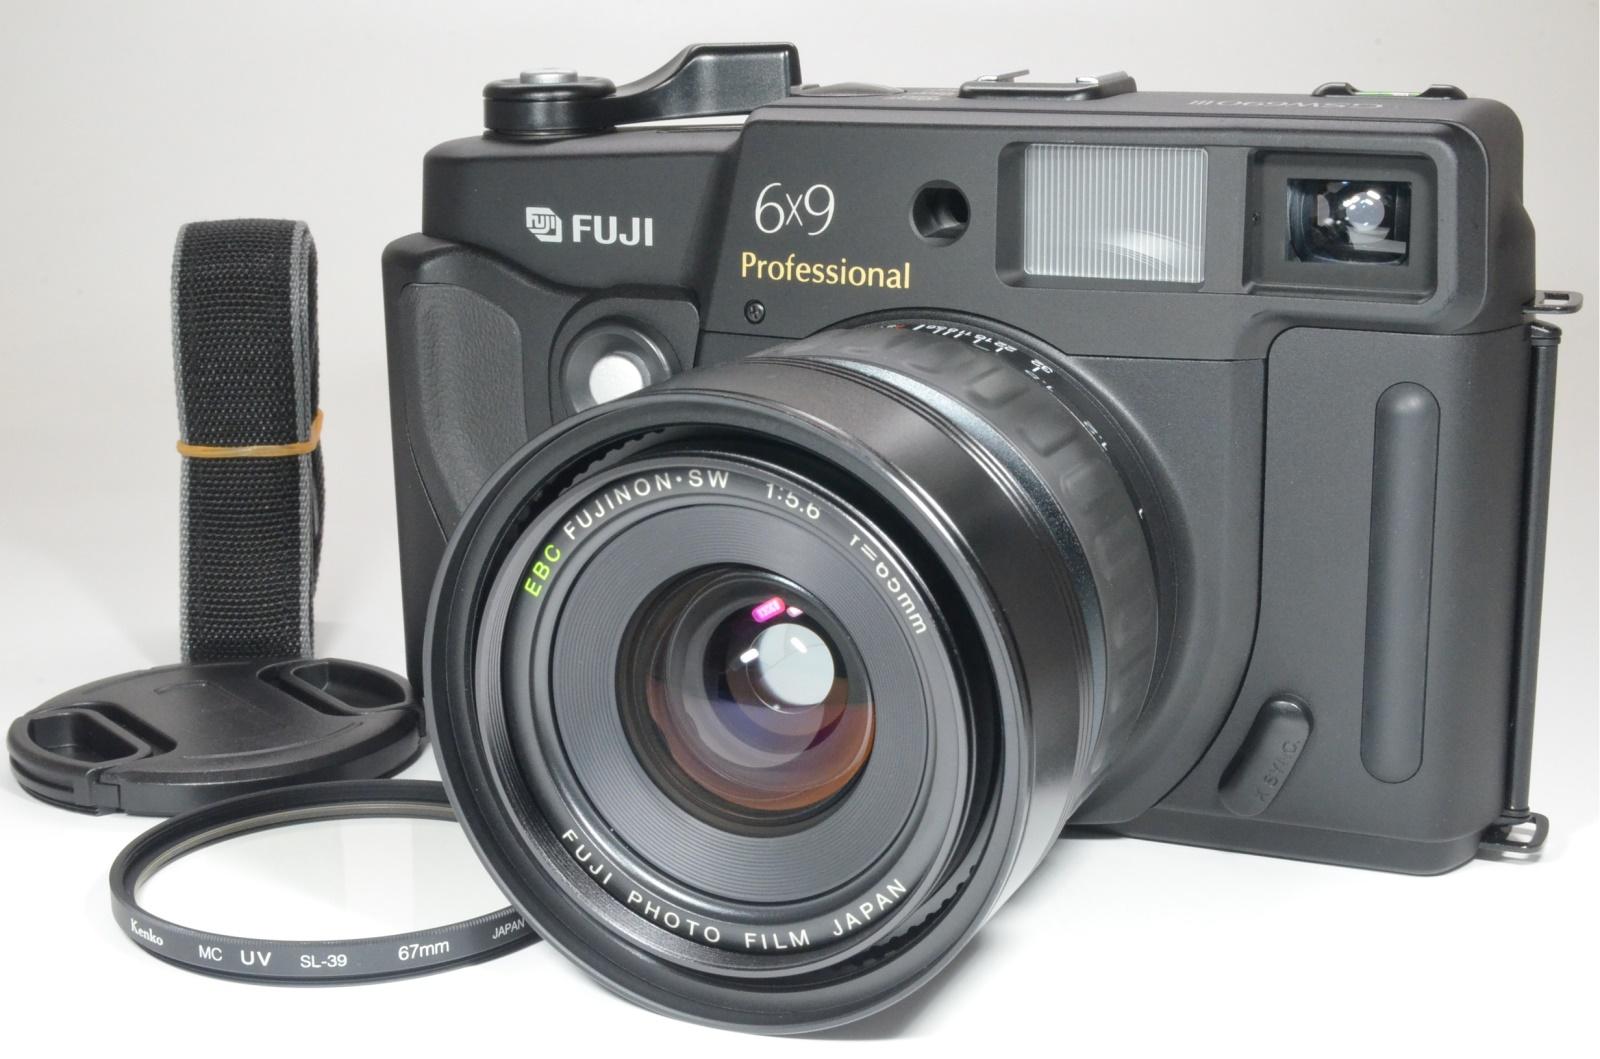 fuji fujifilm gsw690iii 65mm f5.6 count '036' medium format camera